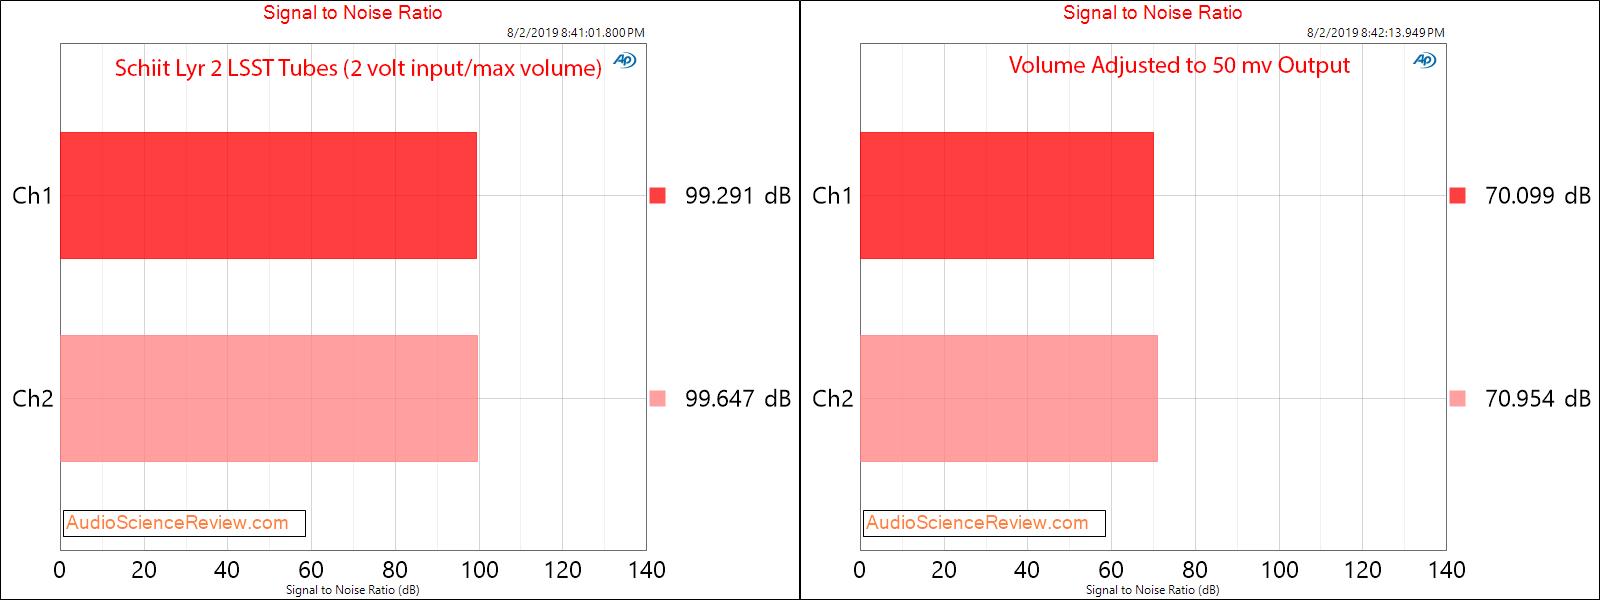 Schiit Lyr 2 Preamplifier  Amplifier LSST tube SNR Audio Measurements.png